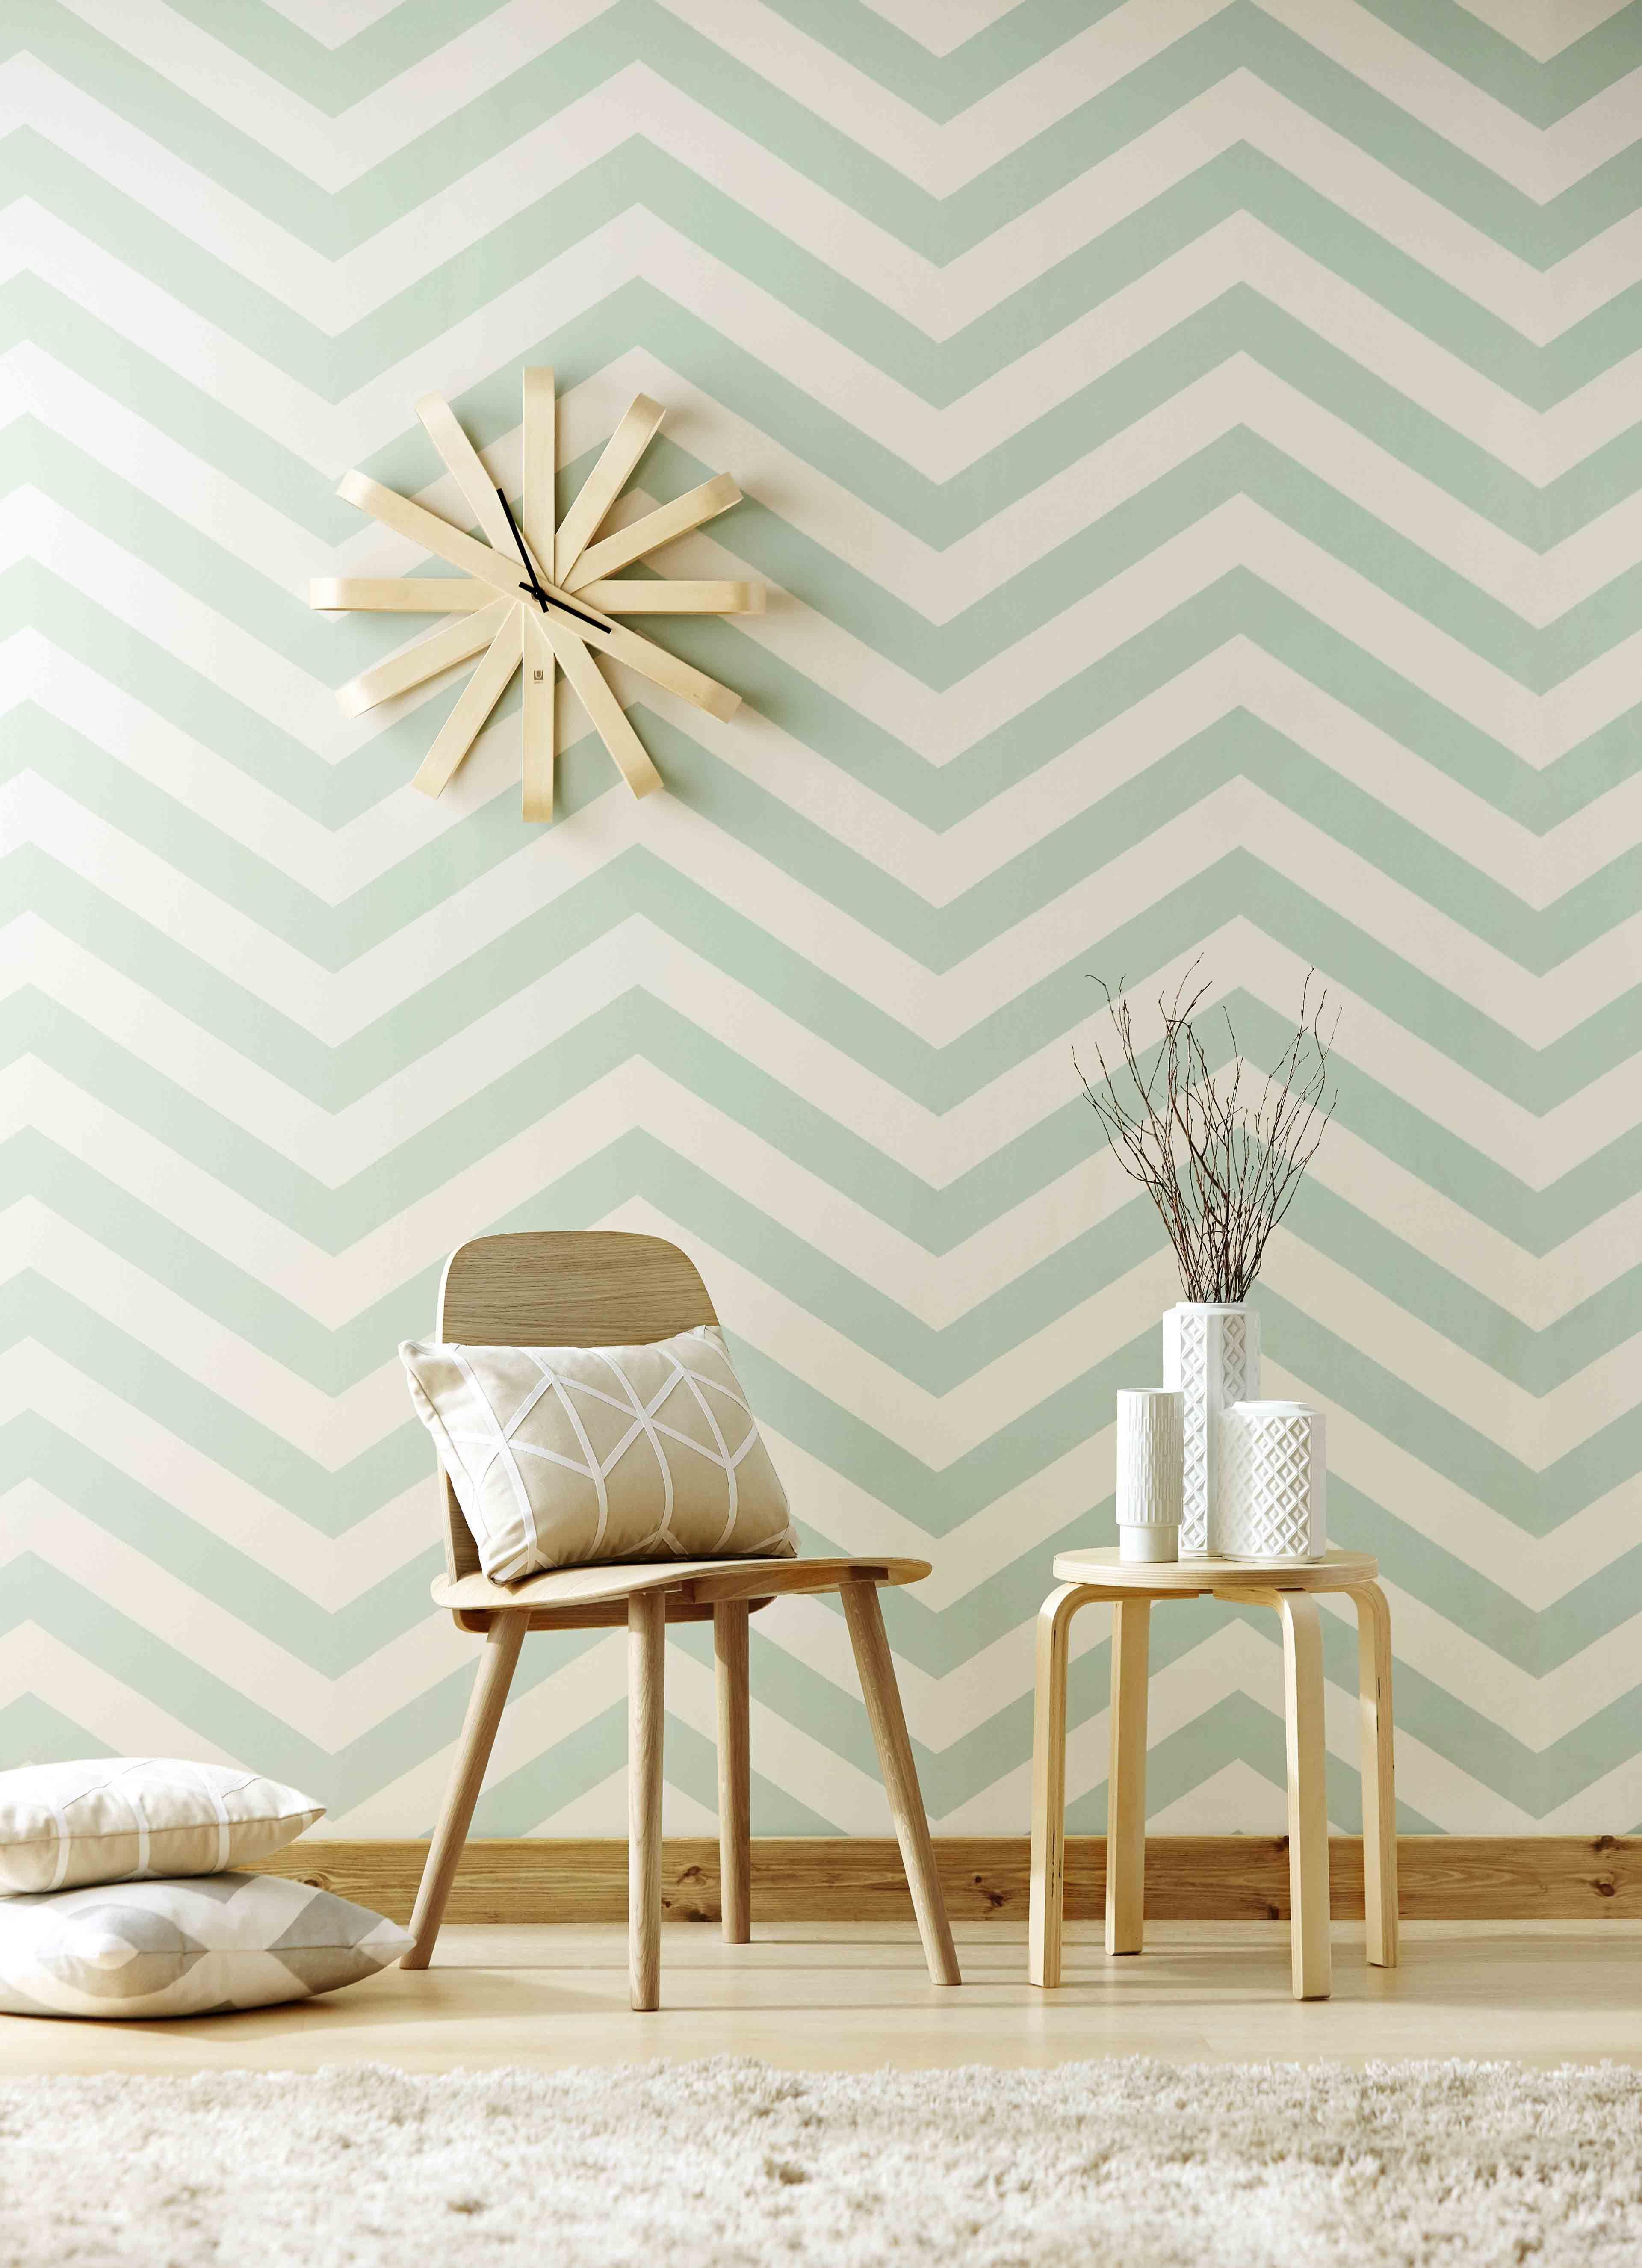 Inspired By The New Scion Range Lohko Patterned Wallpaper Bedroom Modern Wallpaper Bedroom Wallpaper Bedroom Geometric